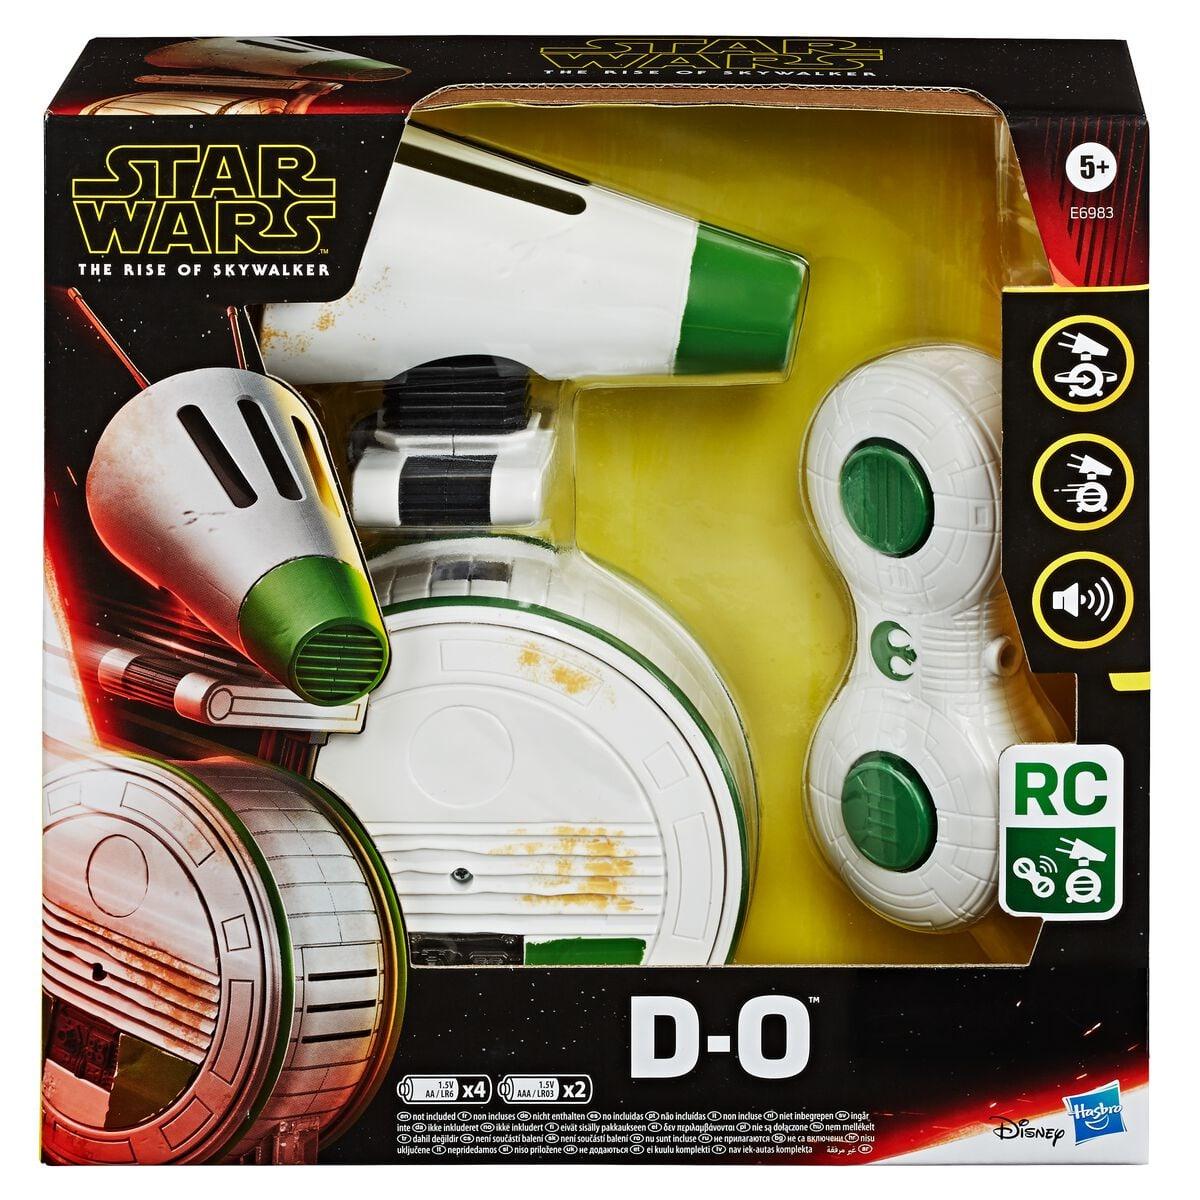 Star Wars Ferngesteuerter D-O rollender elektronischer Droide Ferngesteuerte Spielwaren